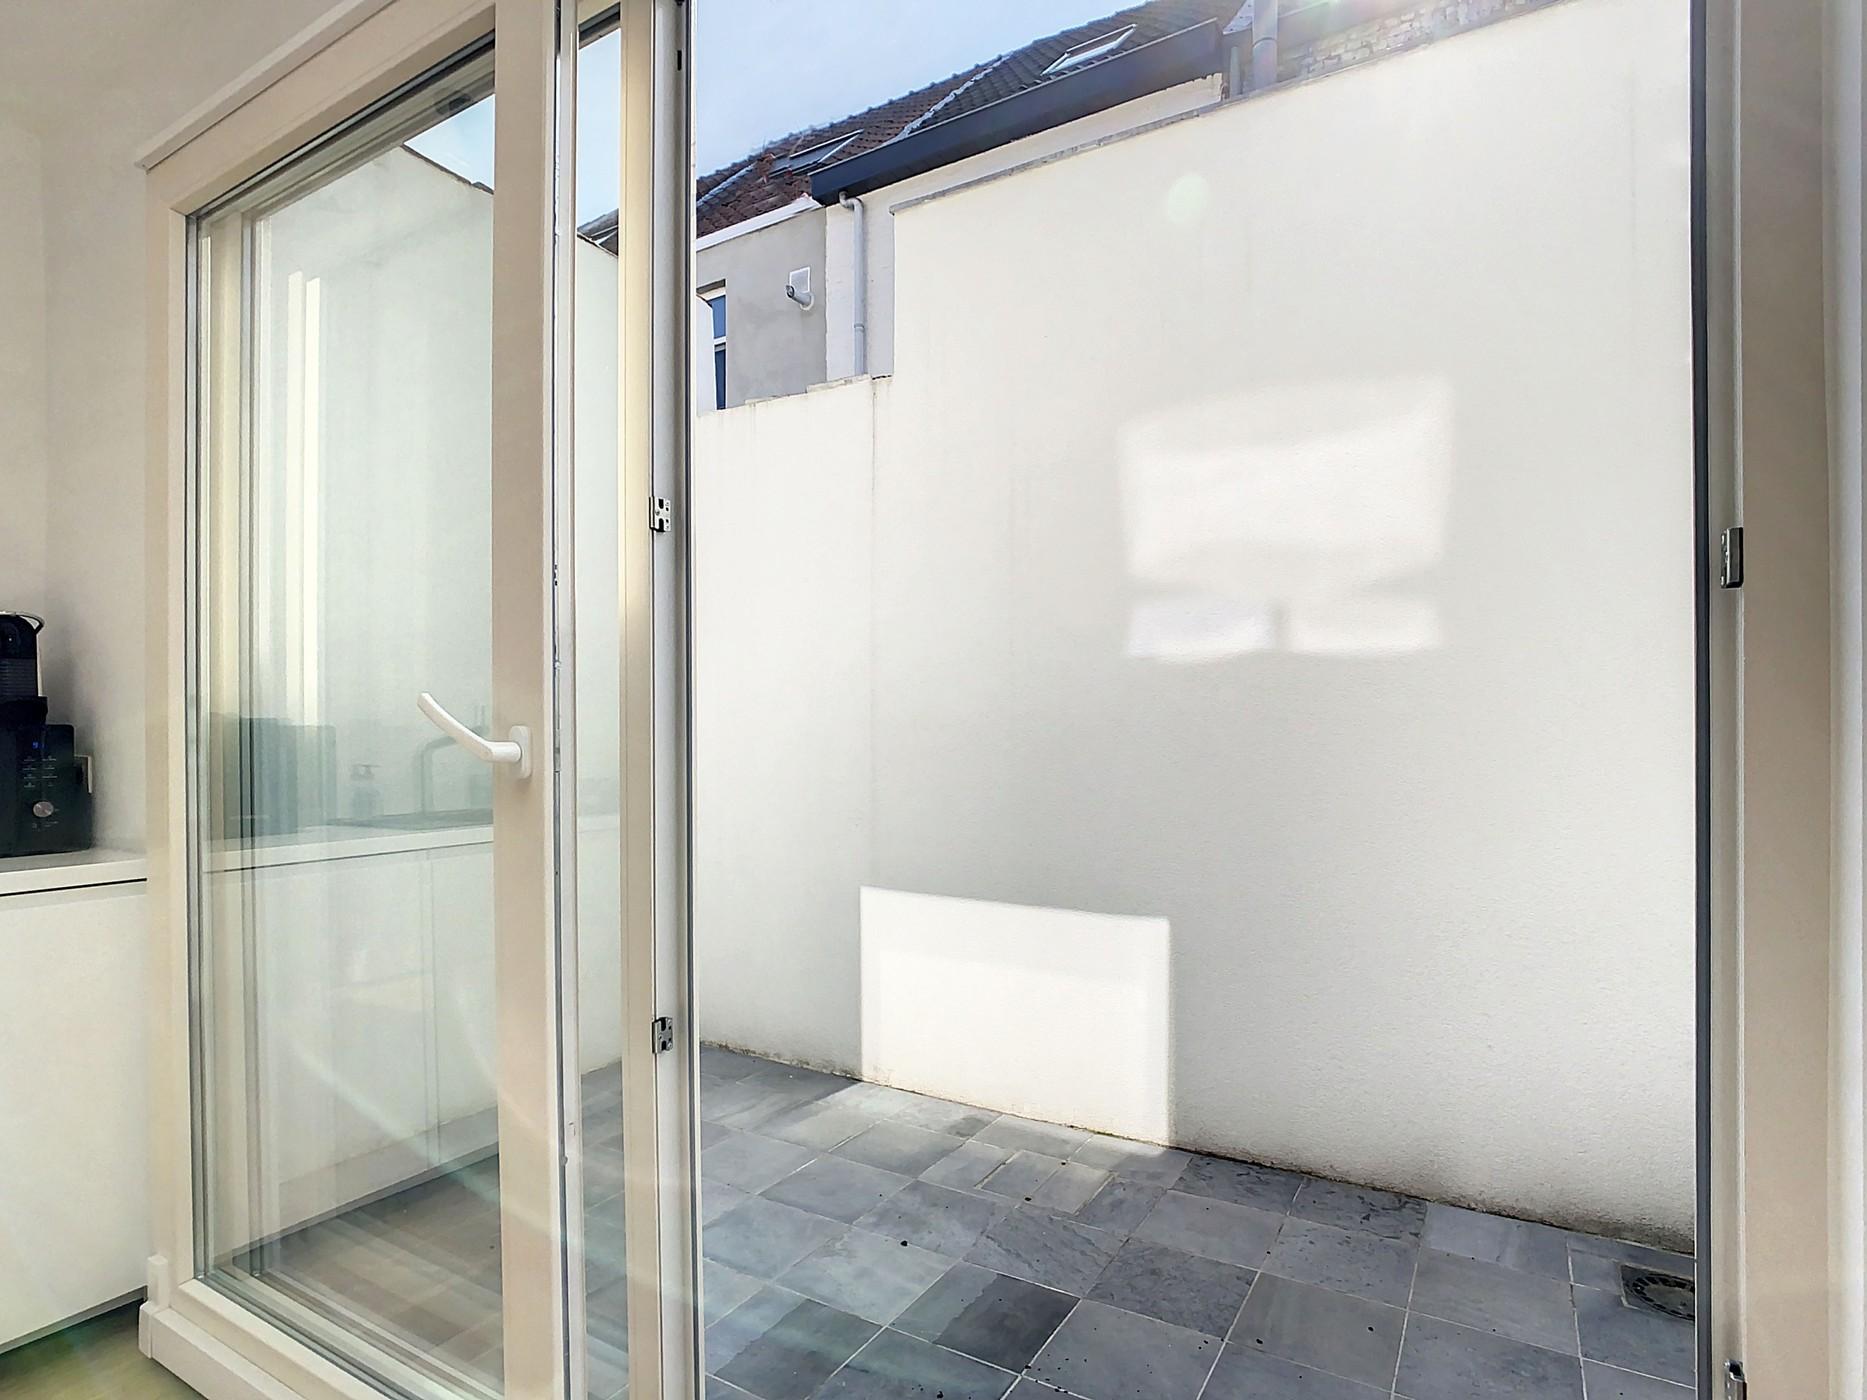 Recent gerenoveerde woning met koer op topligging!